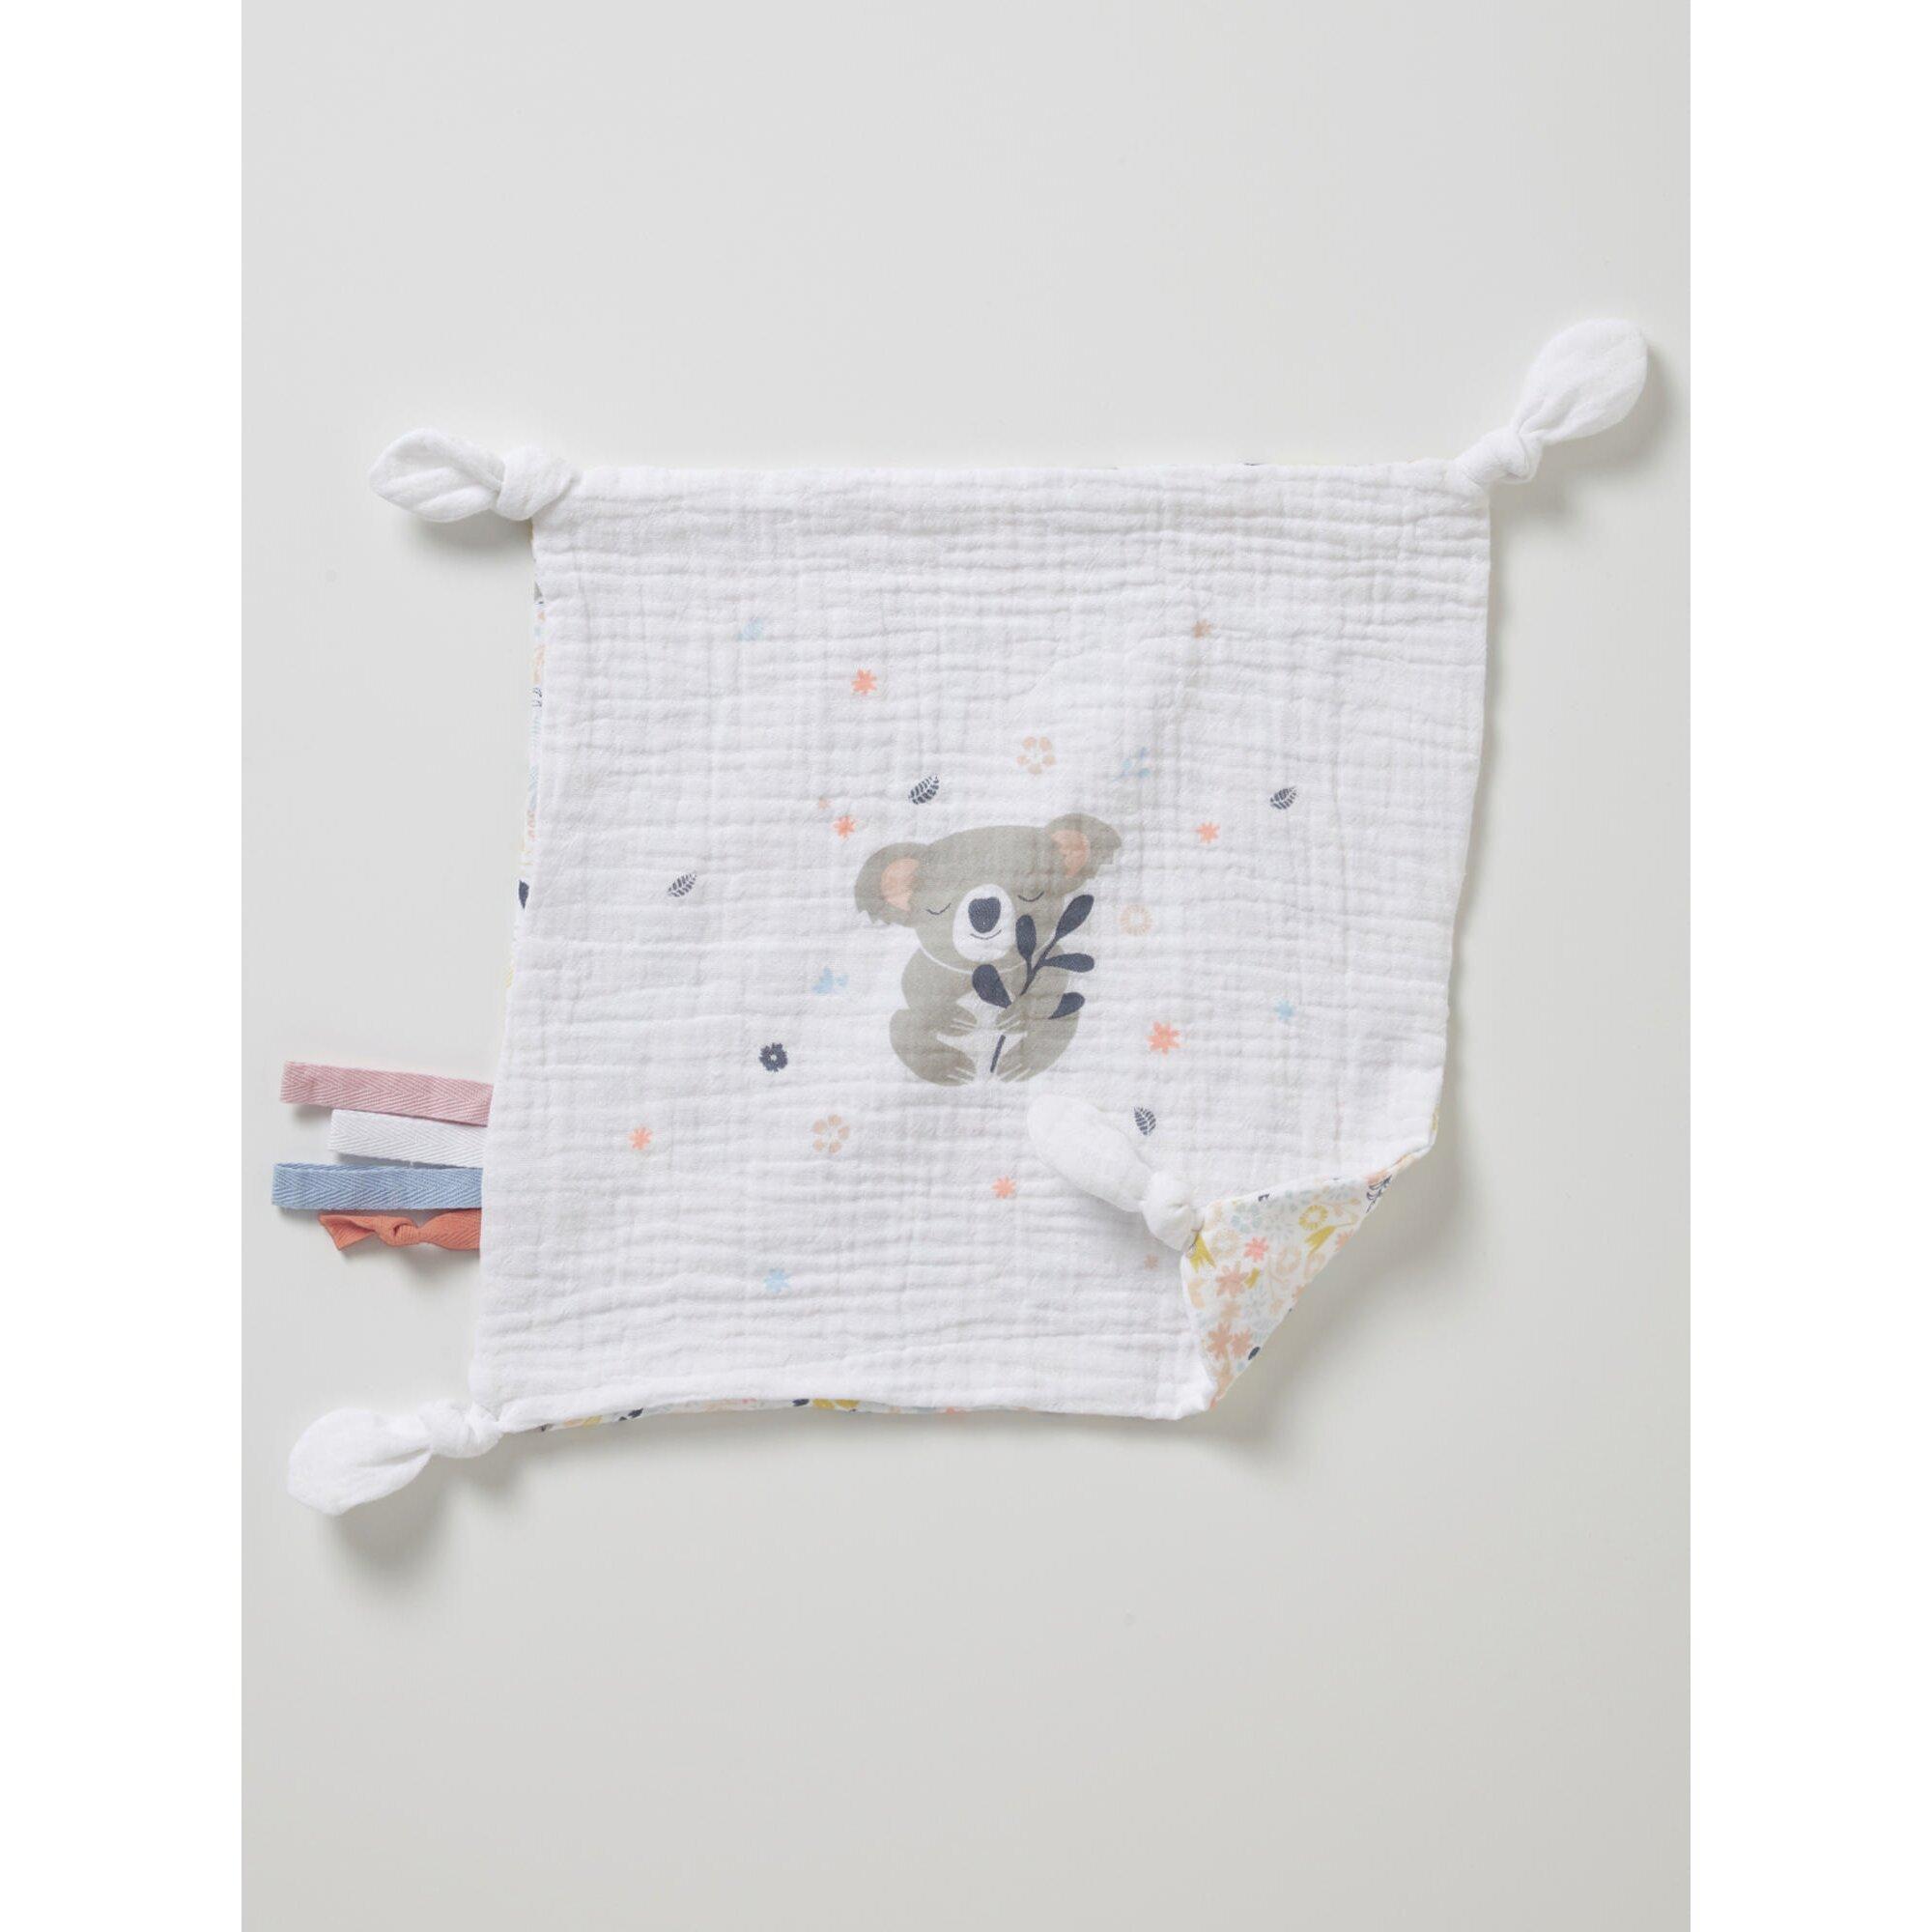 vertbaudet-schmusetuch-fur-babys-koala